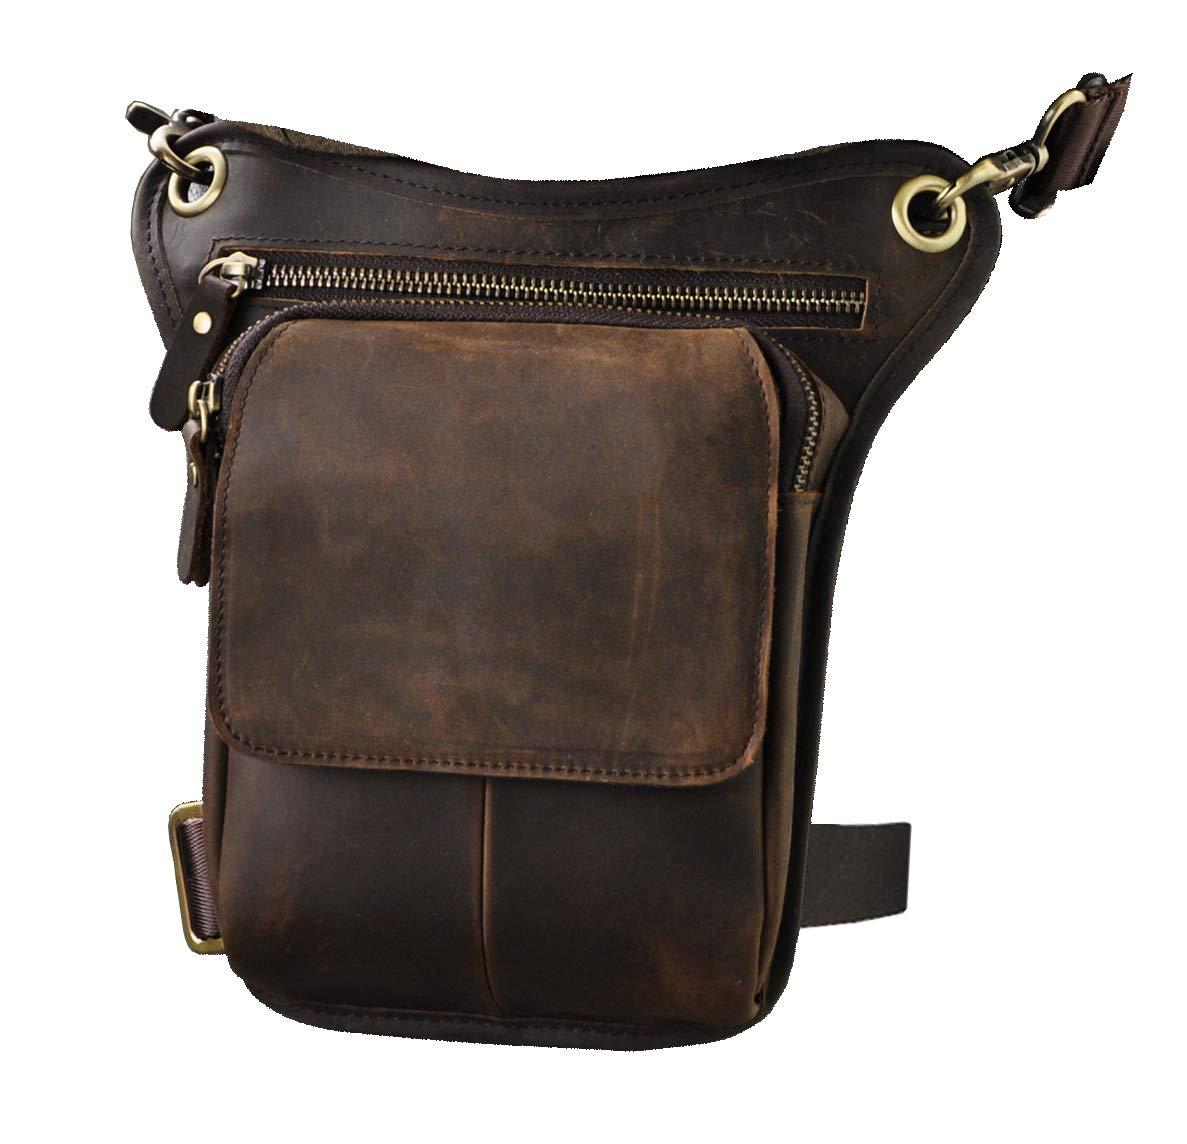 Mens Genuine Leather Messenger Riding Hip Bum Waist Pack Drop Leg Cross Over Bag